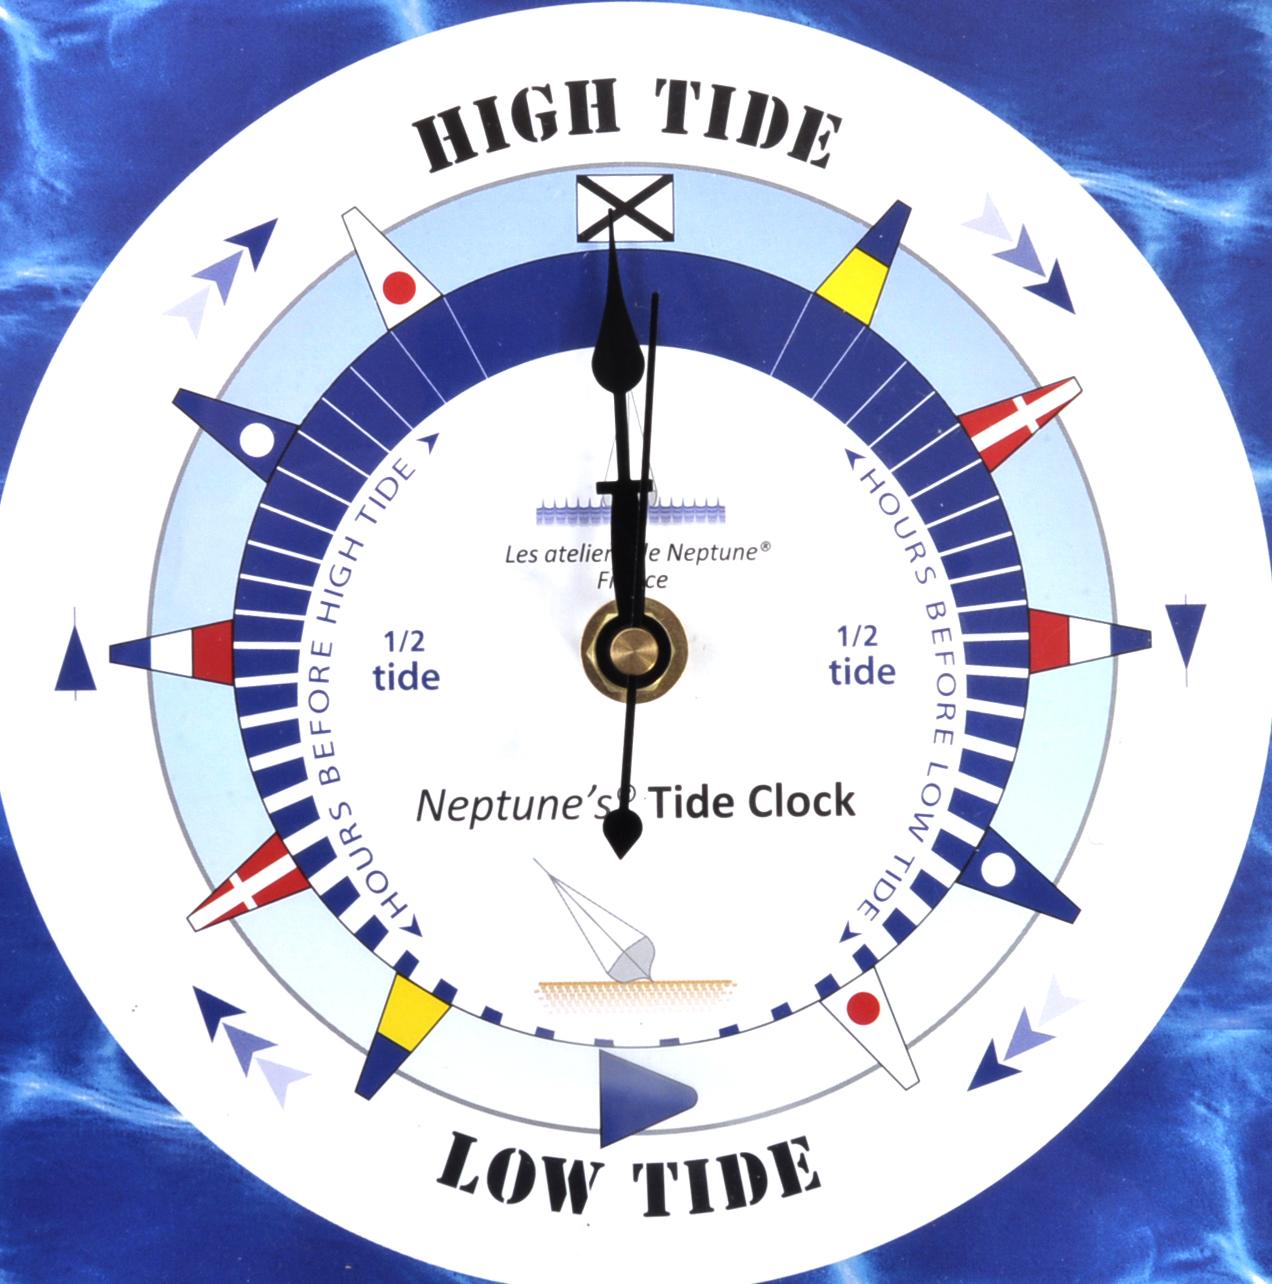 sea dial tide clock acrylic classic dial tc m acr 180 x 180mm - Tide Clock